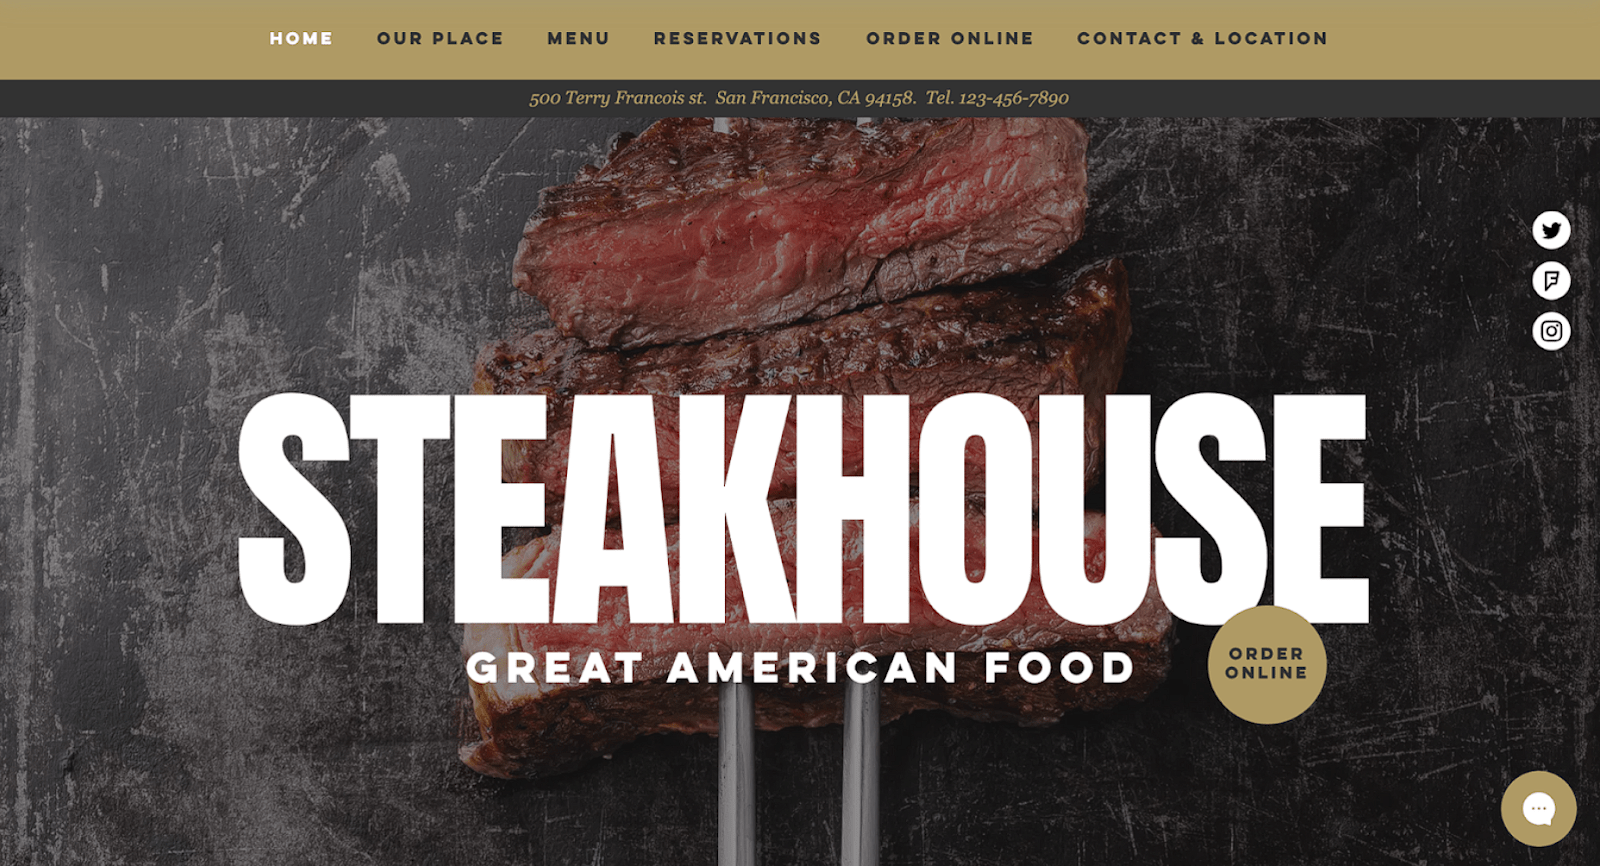 Wix - Restaurant, Steakhouse